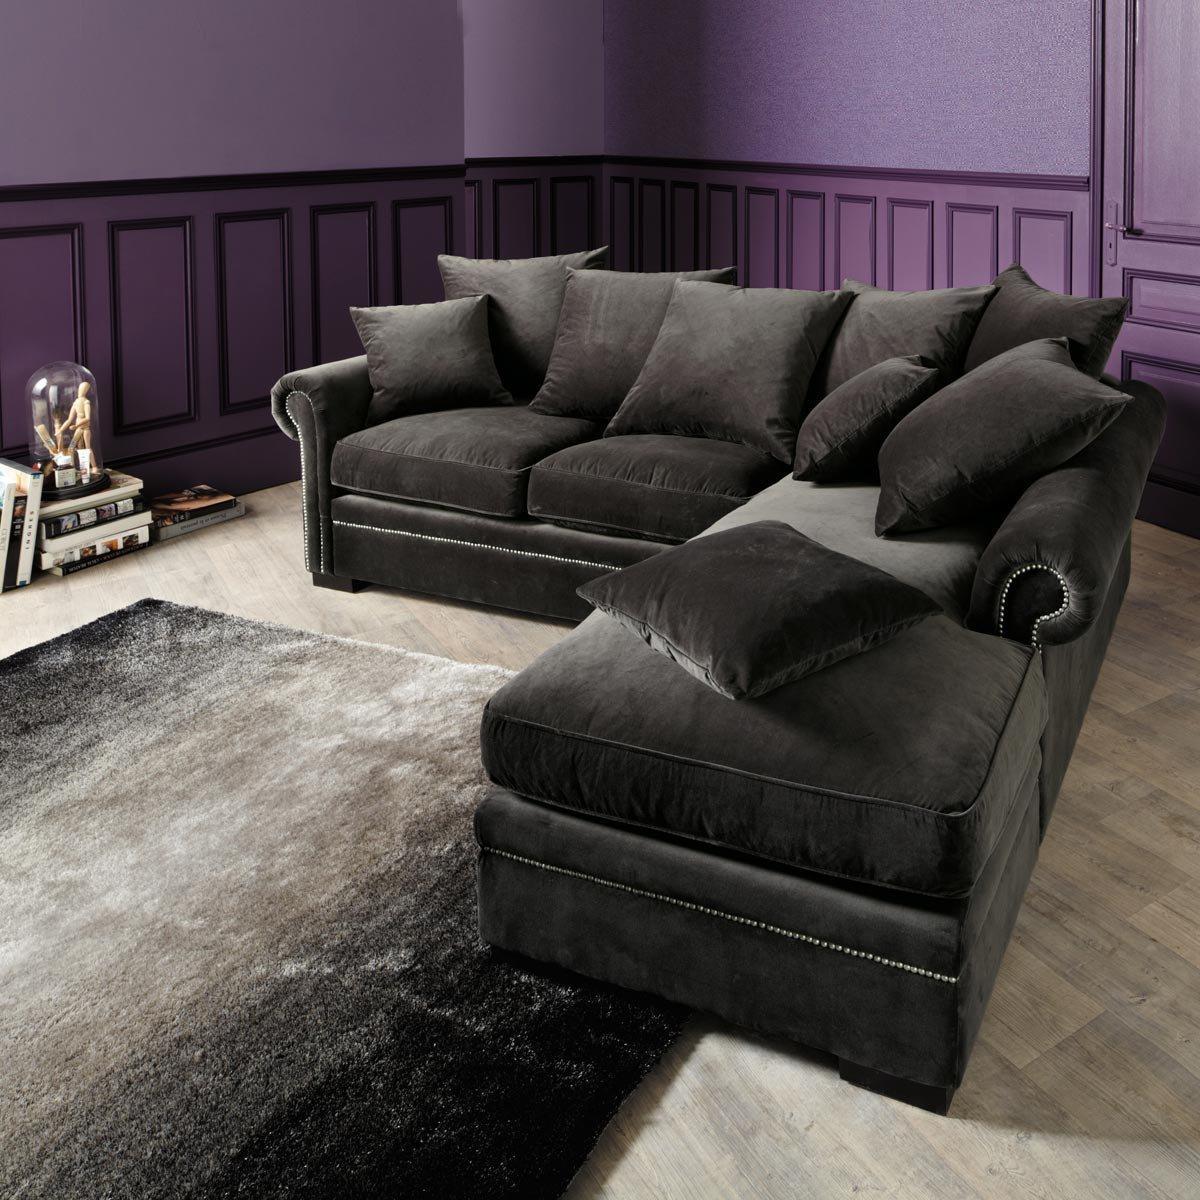 Bradley Sectional Sofa | Sofa Gallery | Kengire Within Bradley Sectional Sofas (View 3 of 20)